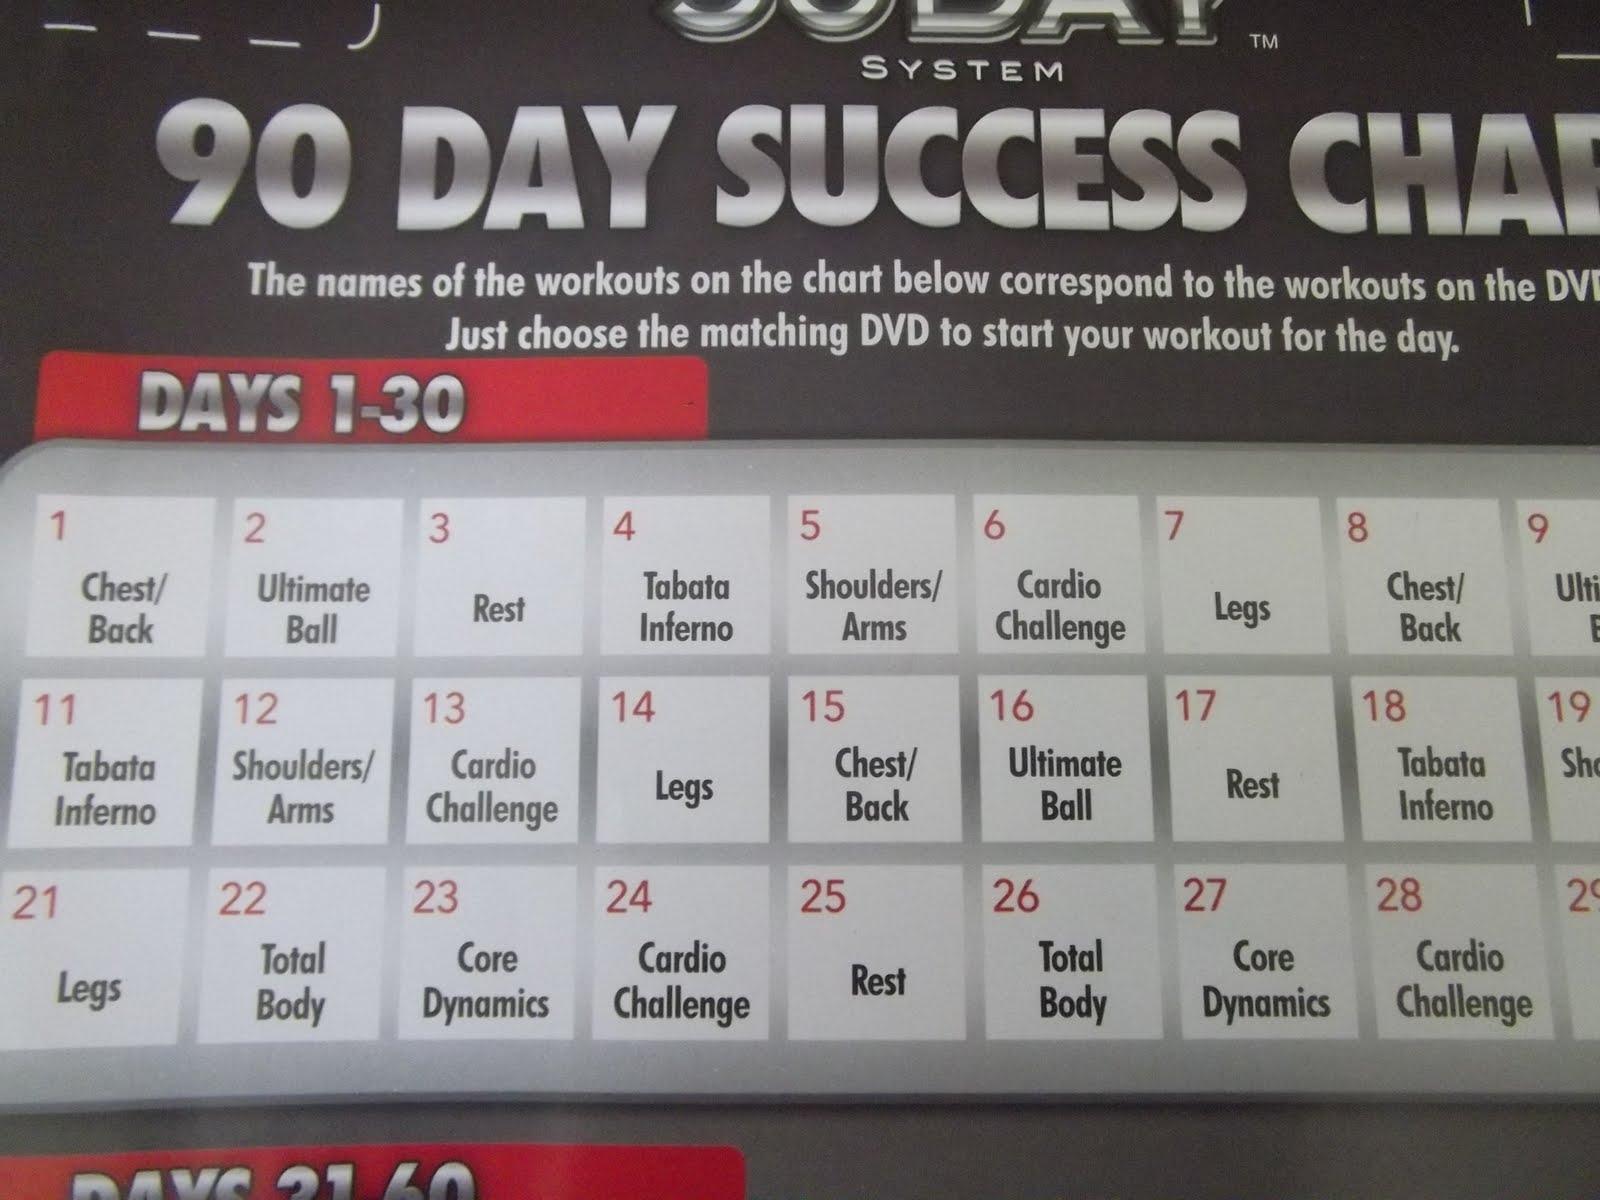 Supreme 90 Day Workout Cardio Challenge - Workoutwalls